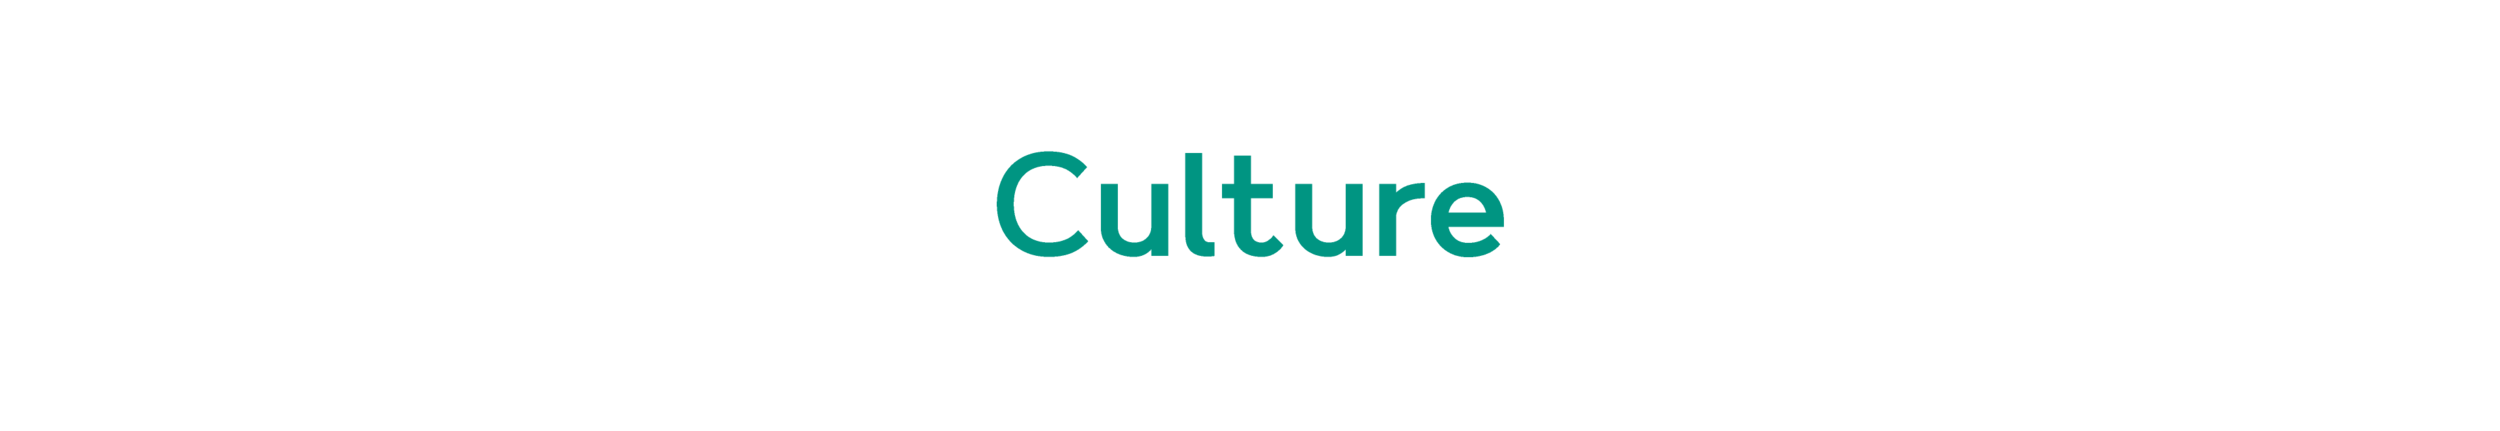 culture_title.png